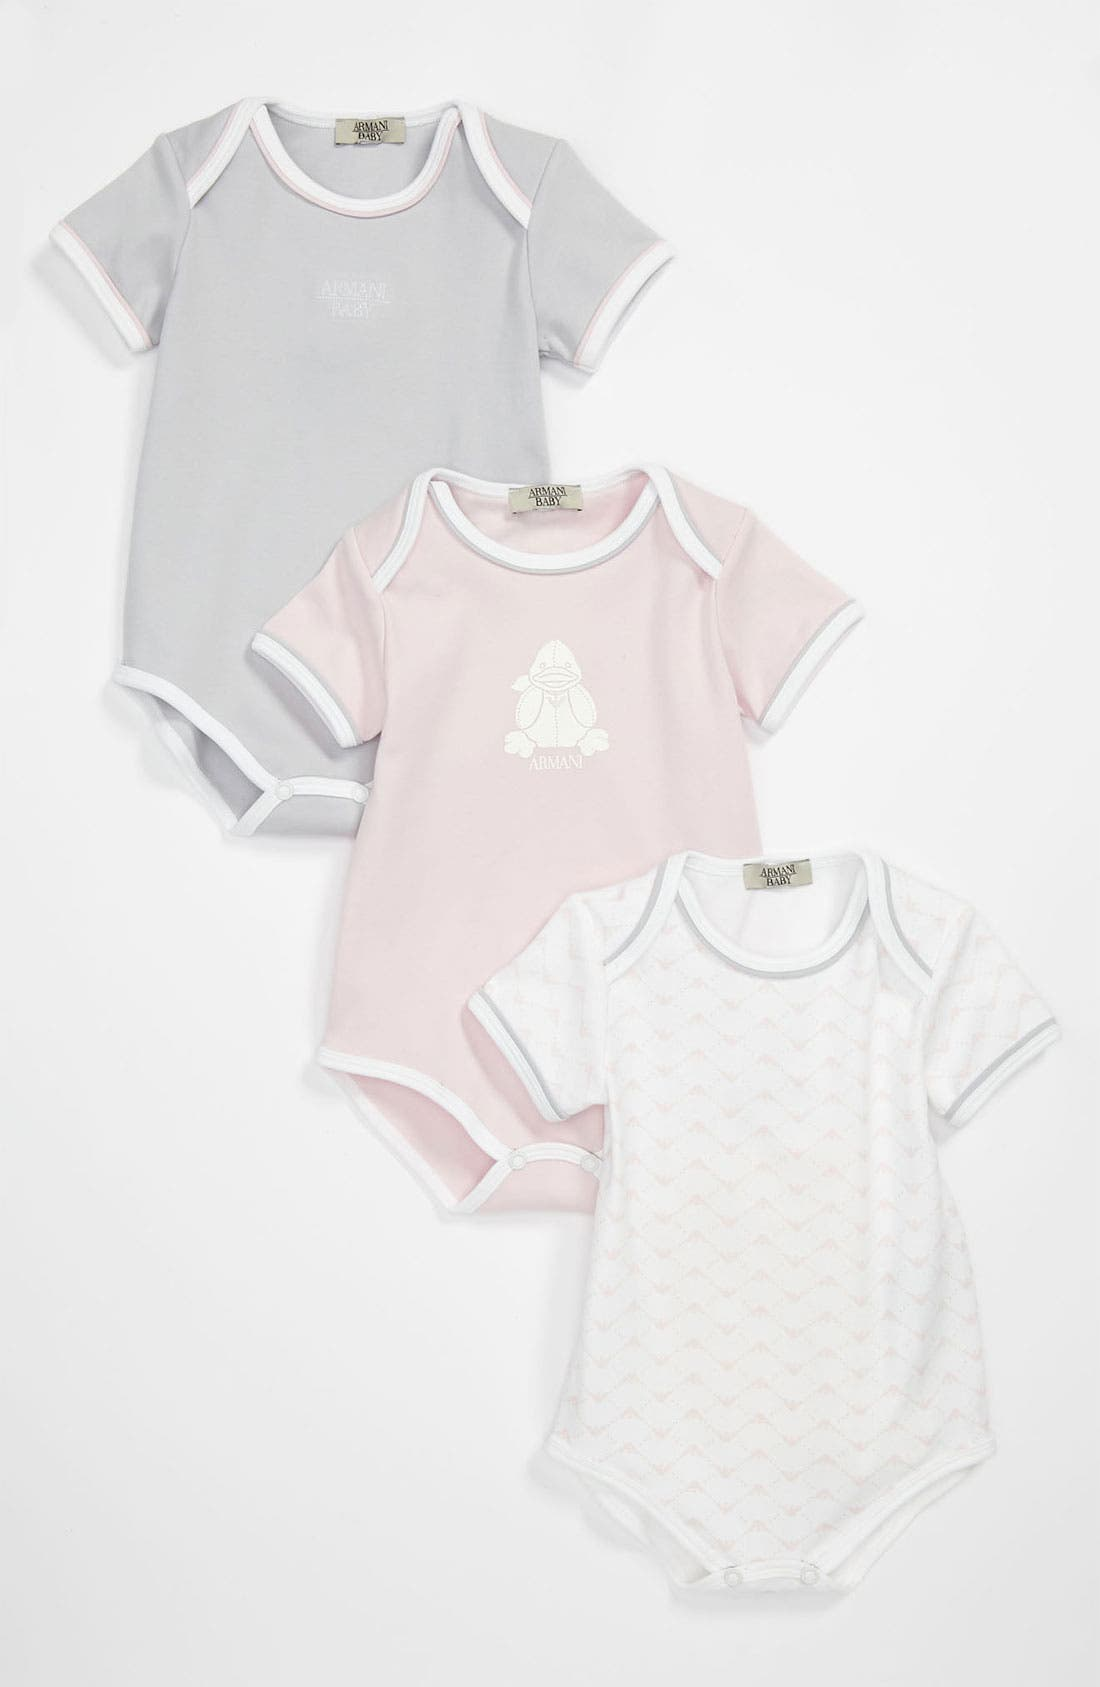 Main Image - Armani Junior Bodysuit Set (Baby)